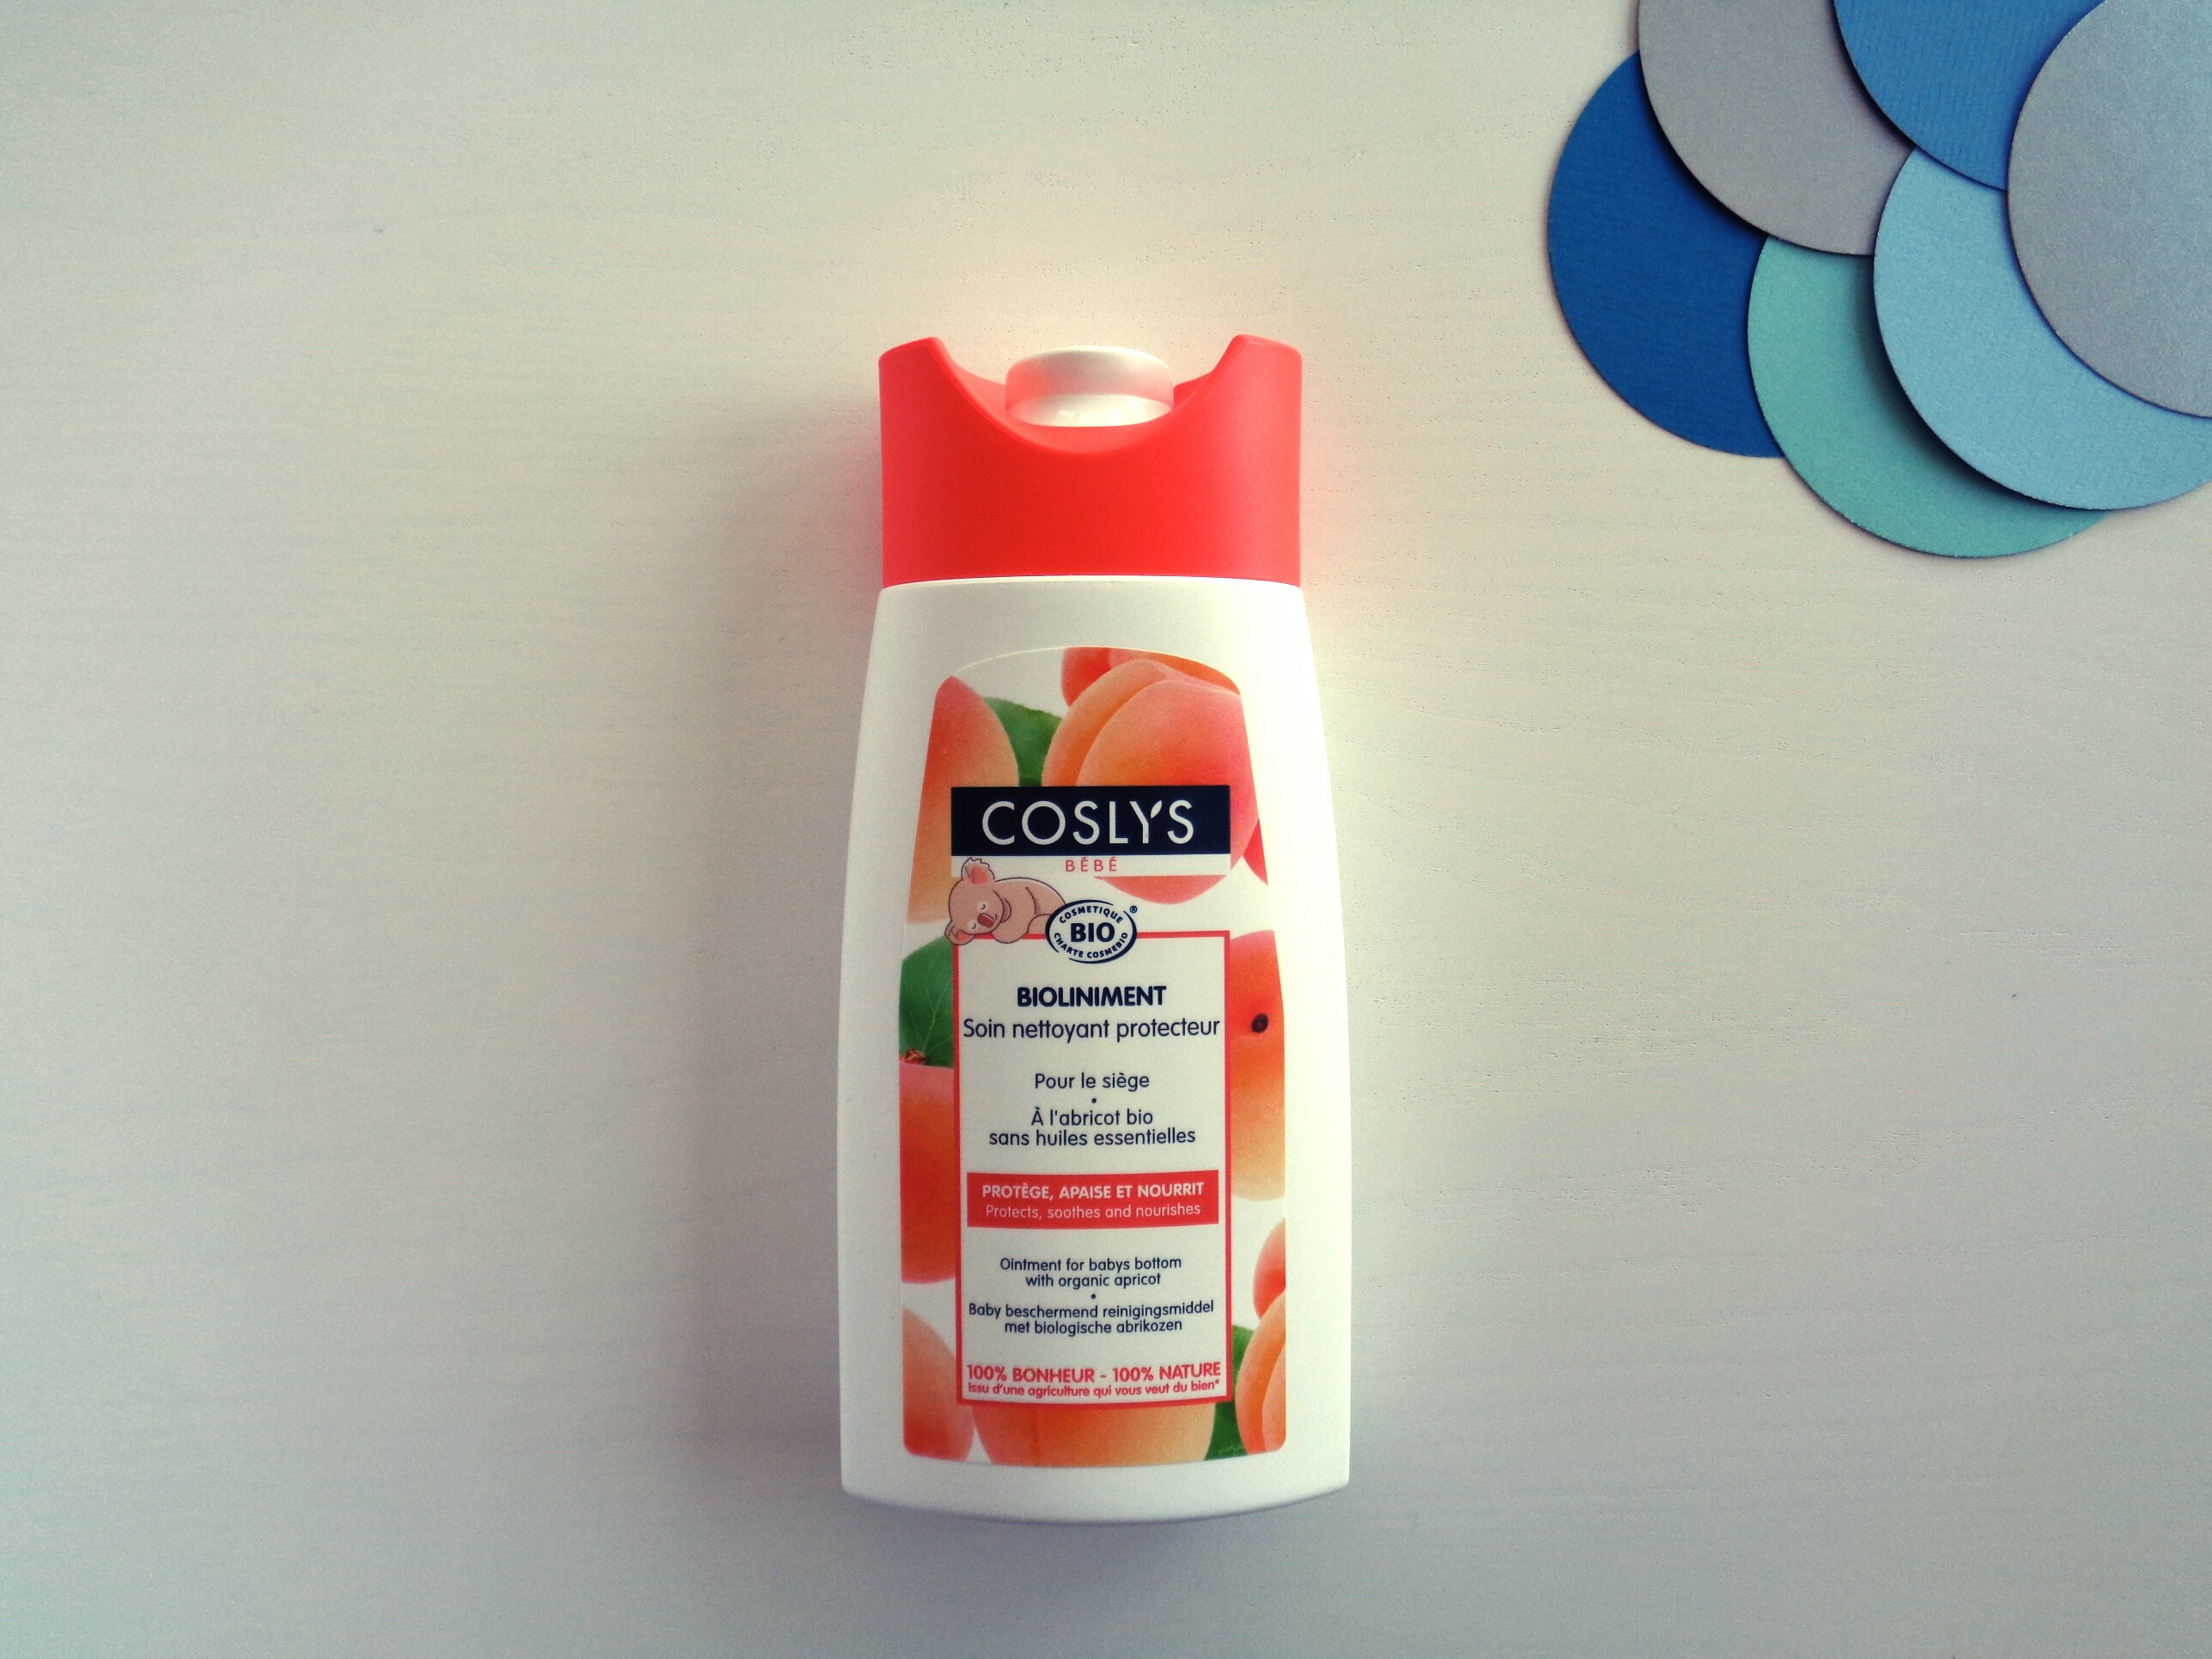 Coslys – Bioliniment spécial siège (250ml) – Bébé